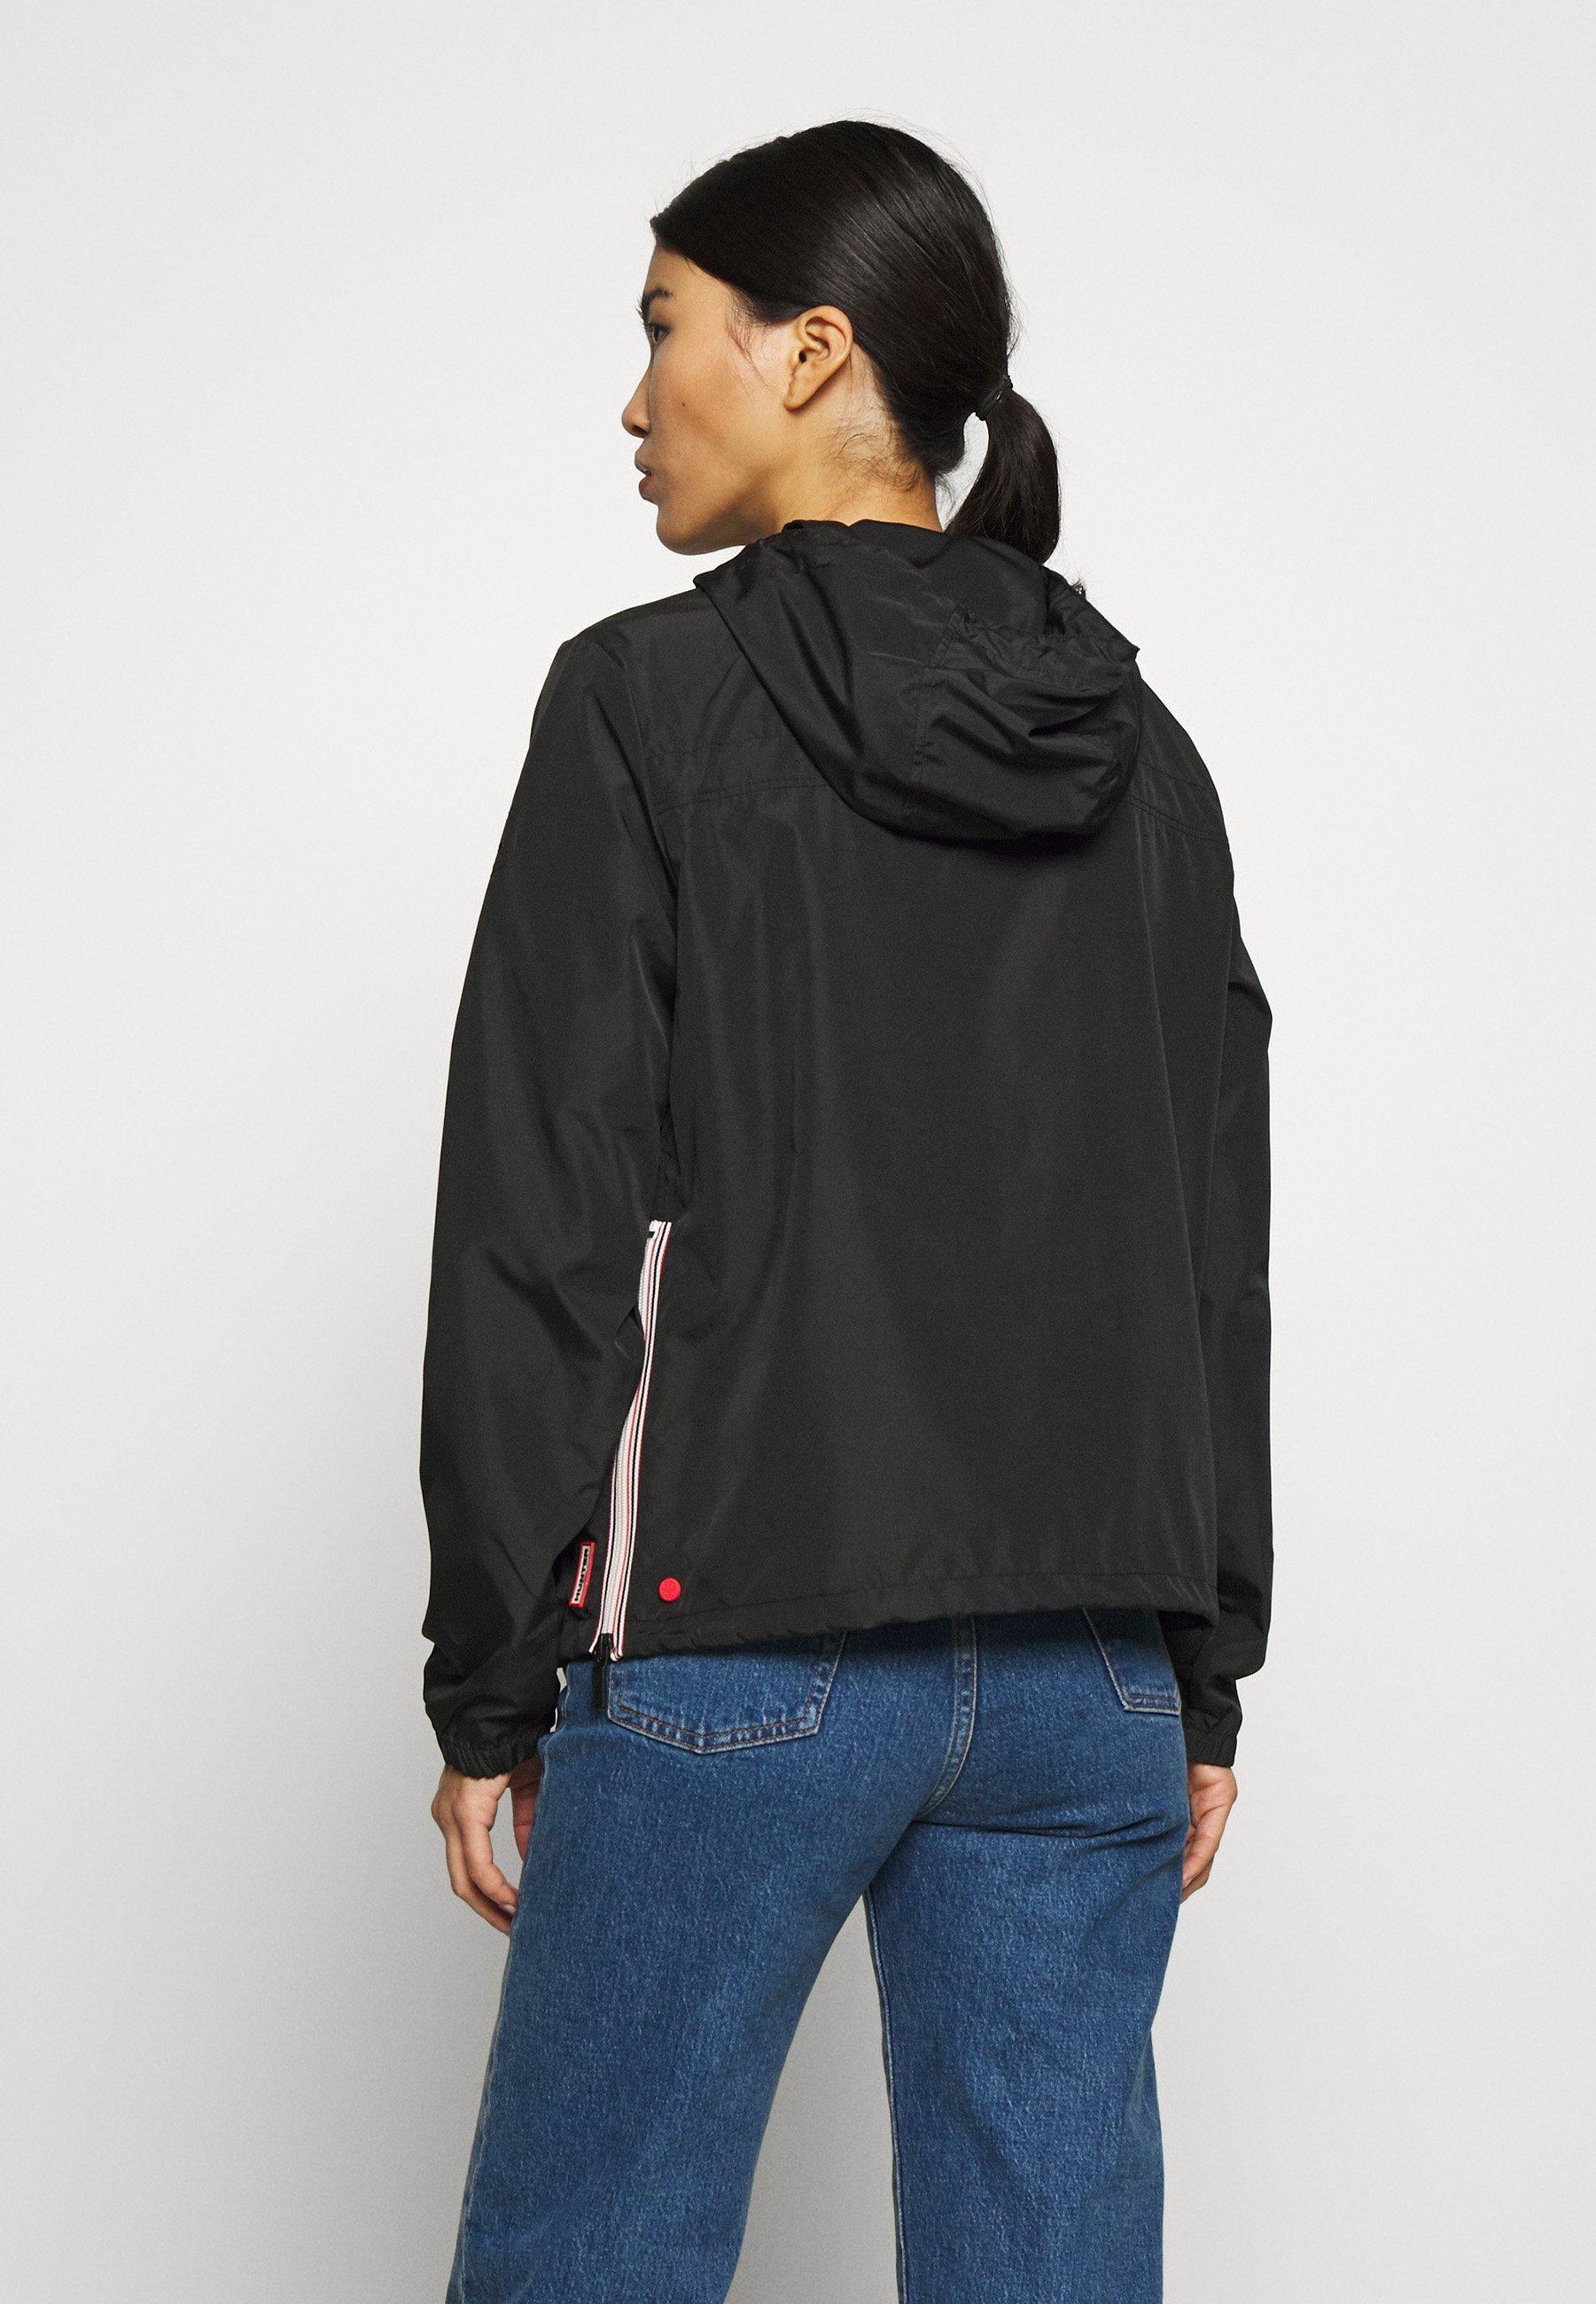 Hunter ORIGINAL WOMENS ORIGINAL SHELL WINDBREAKER - Windbreaker - black | Damenbekleidung billig